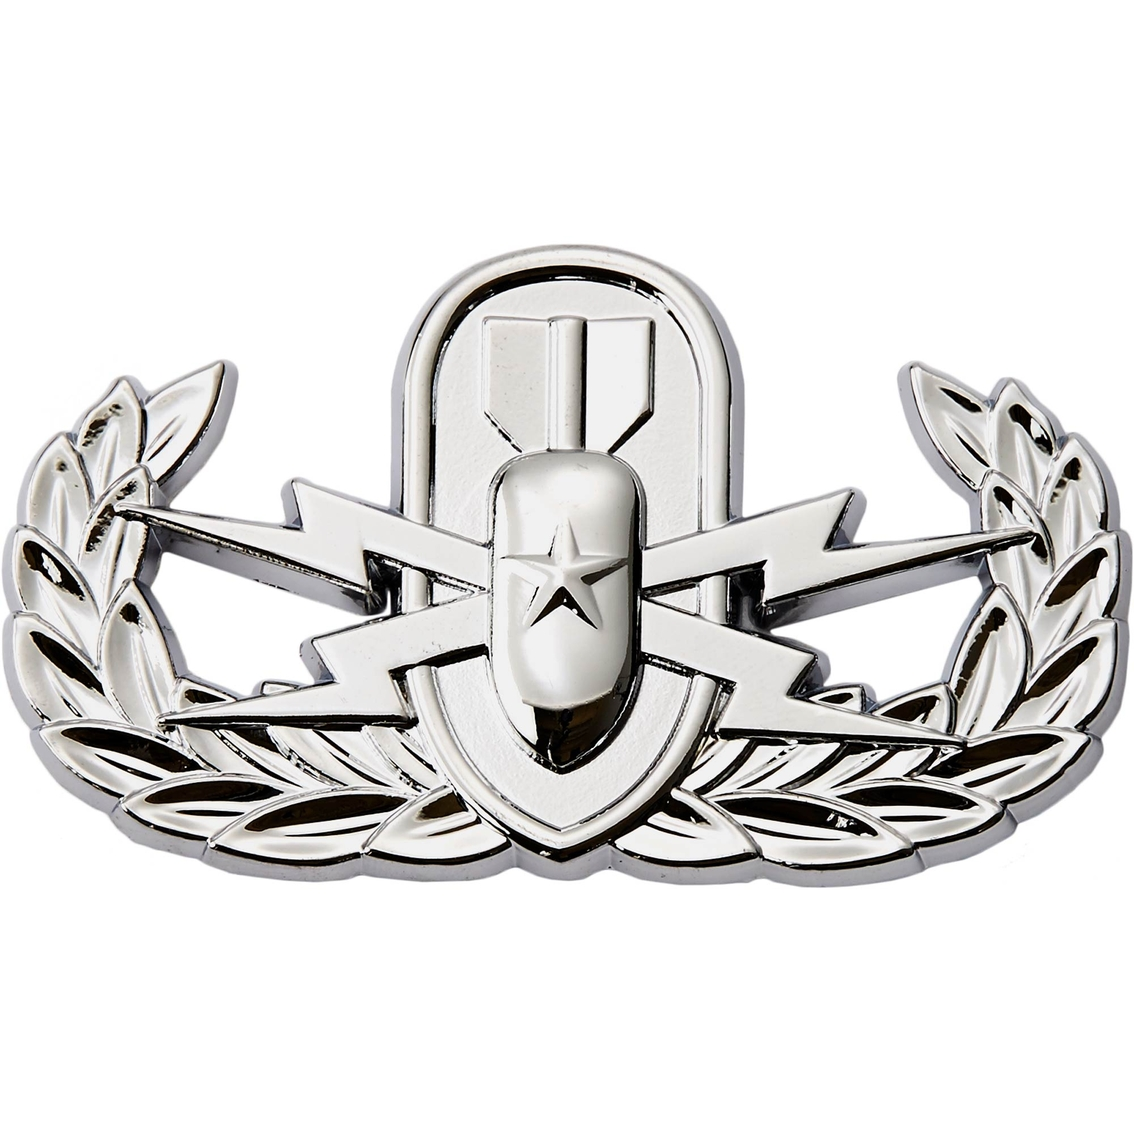 Shadow Six Romeo Senior Eod Emblem Military Logo Gear Military